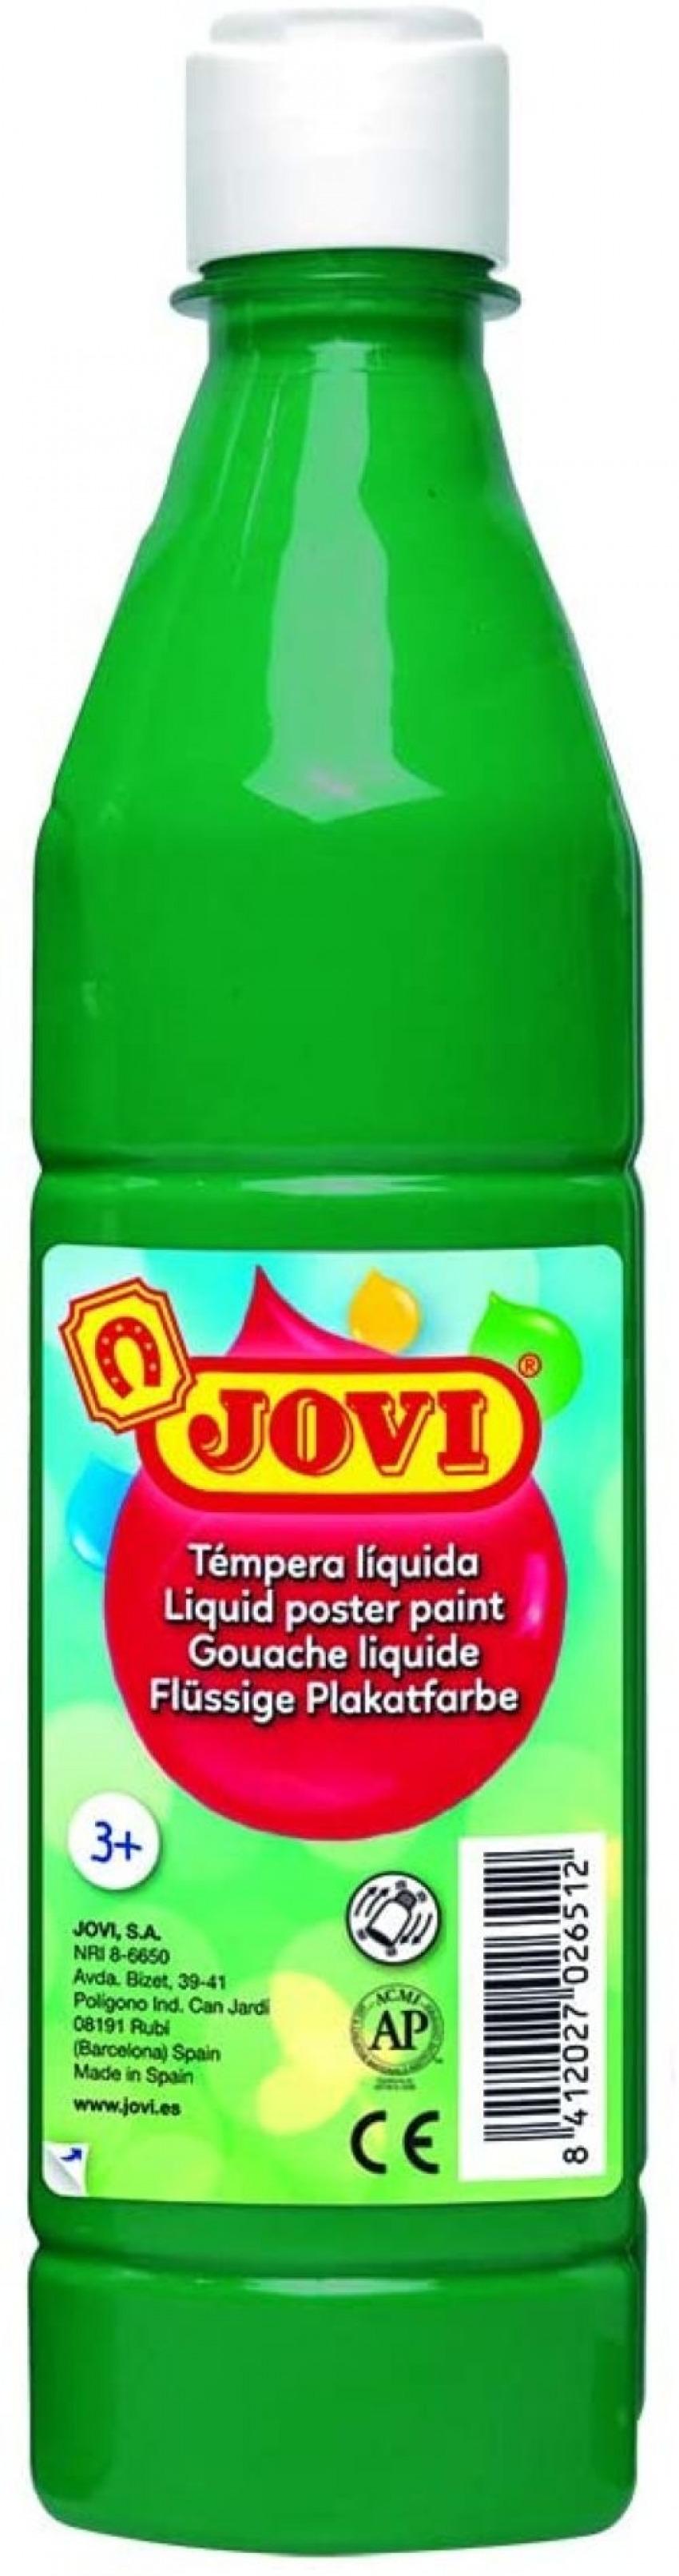 Bote tempera liquida jovi verde oscuro 500 ml 8412027003711